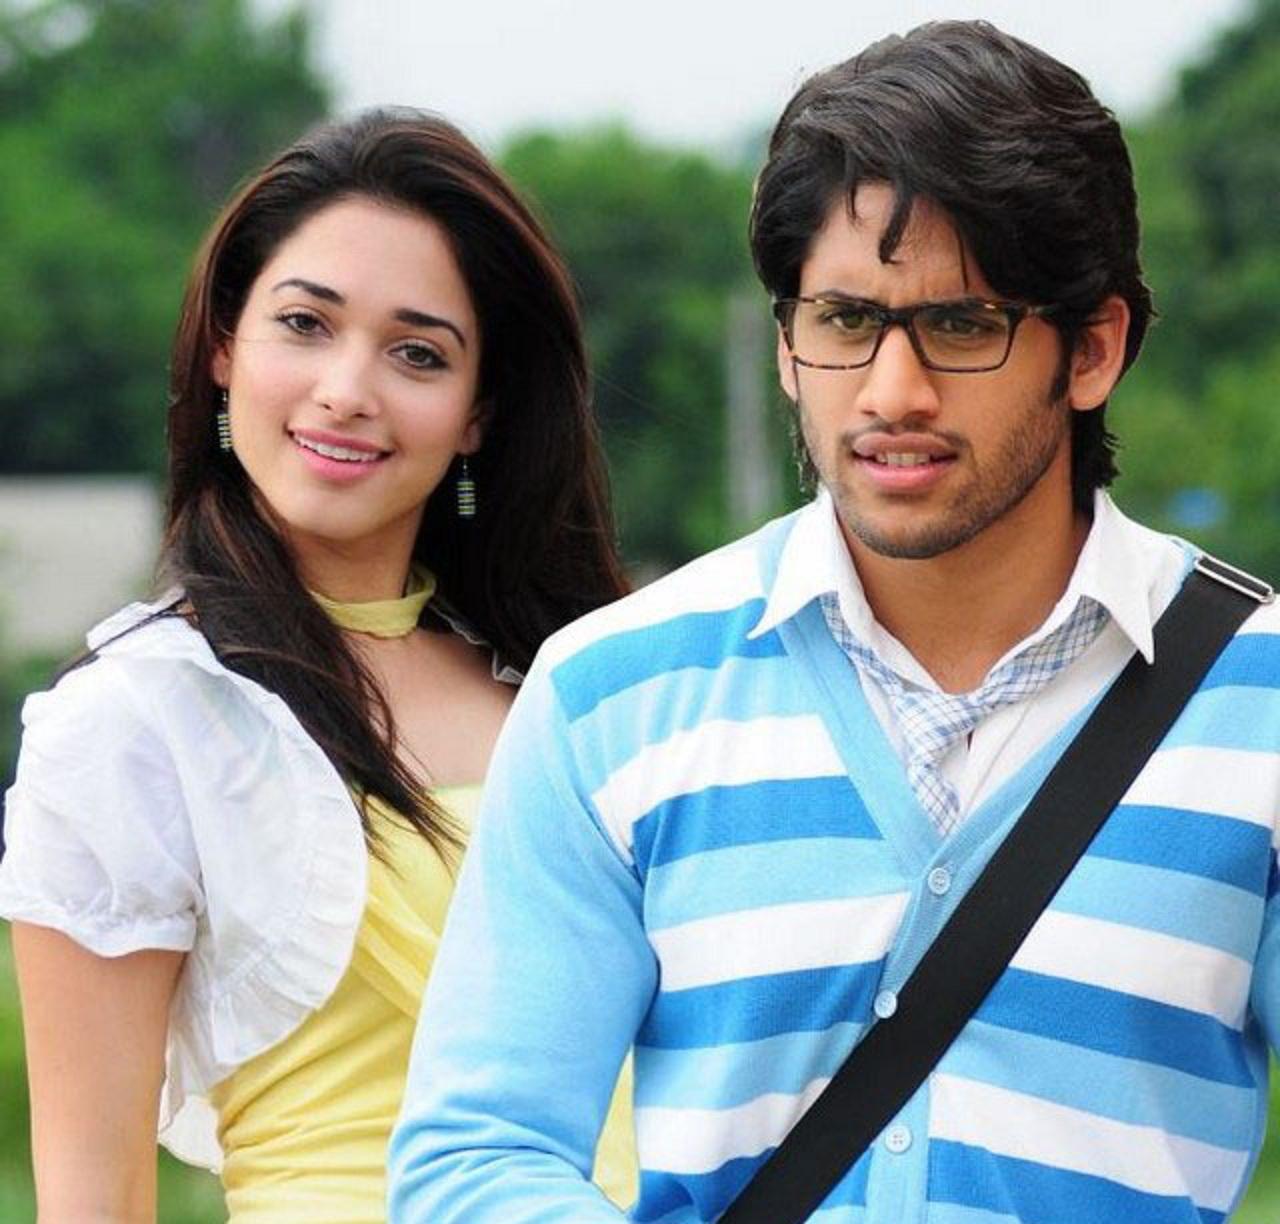 tamanna bhatia and mahesh babu wallpaper download | every couples hd